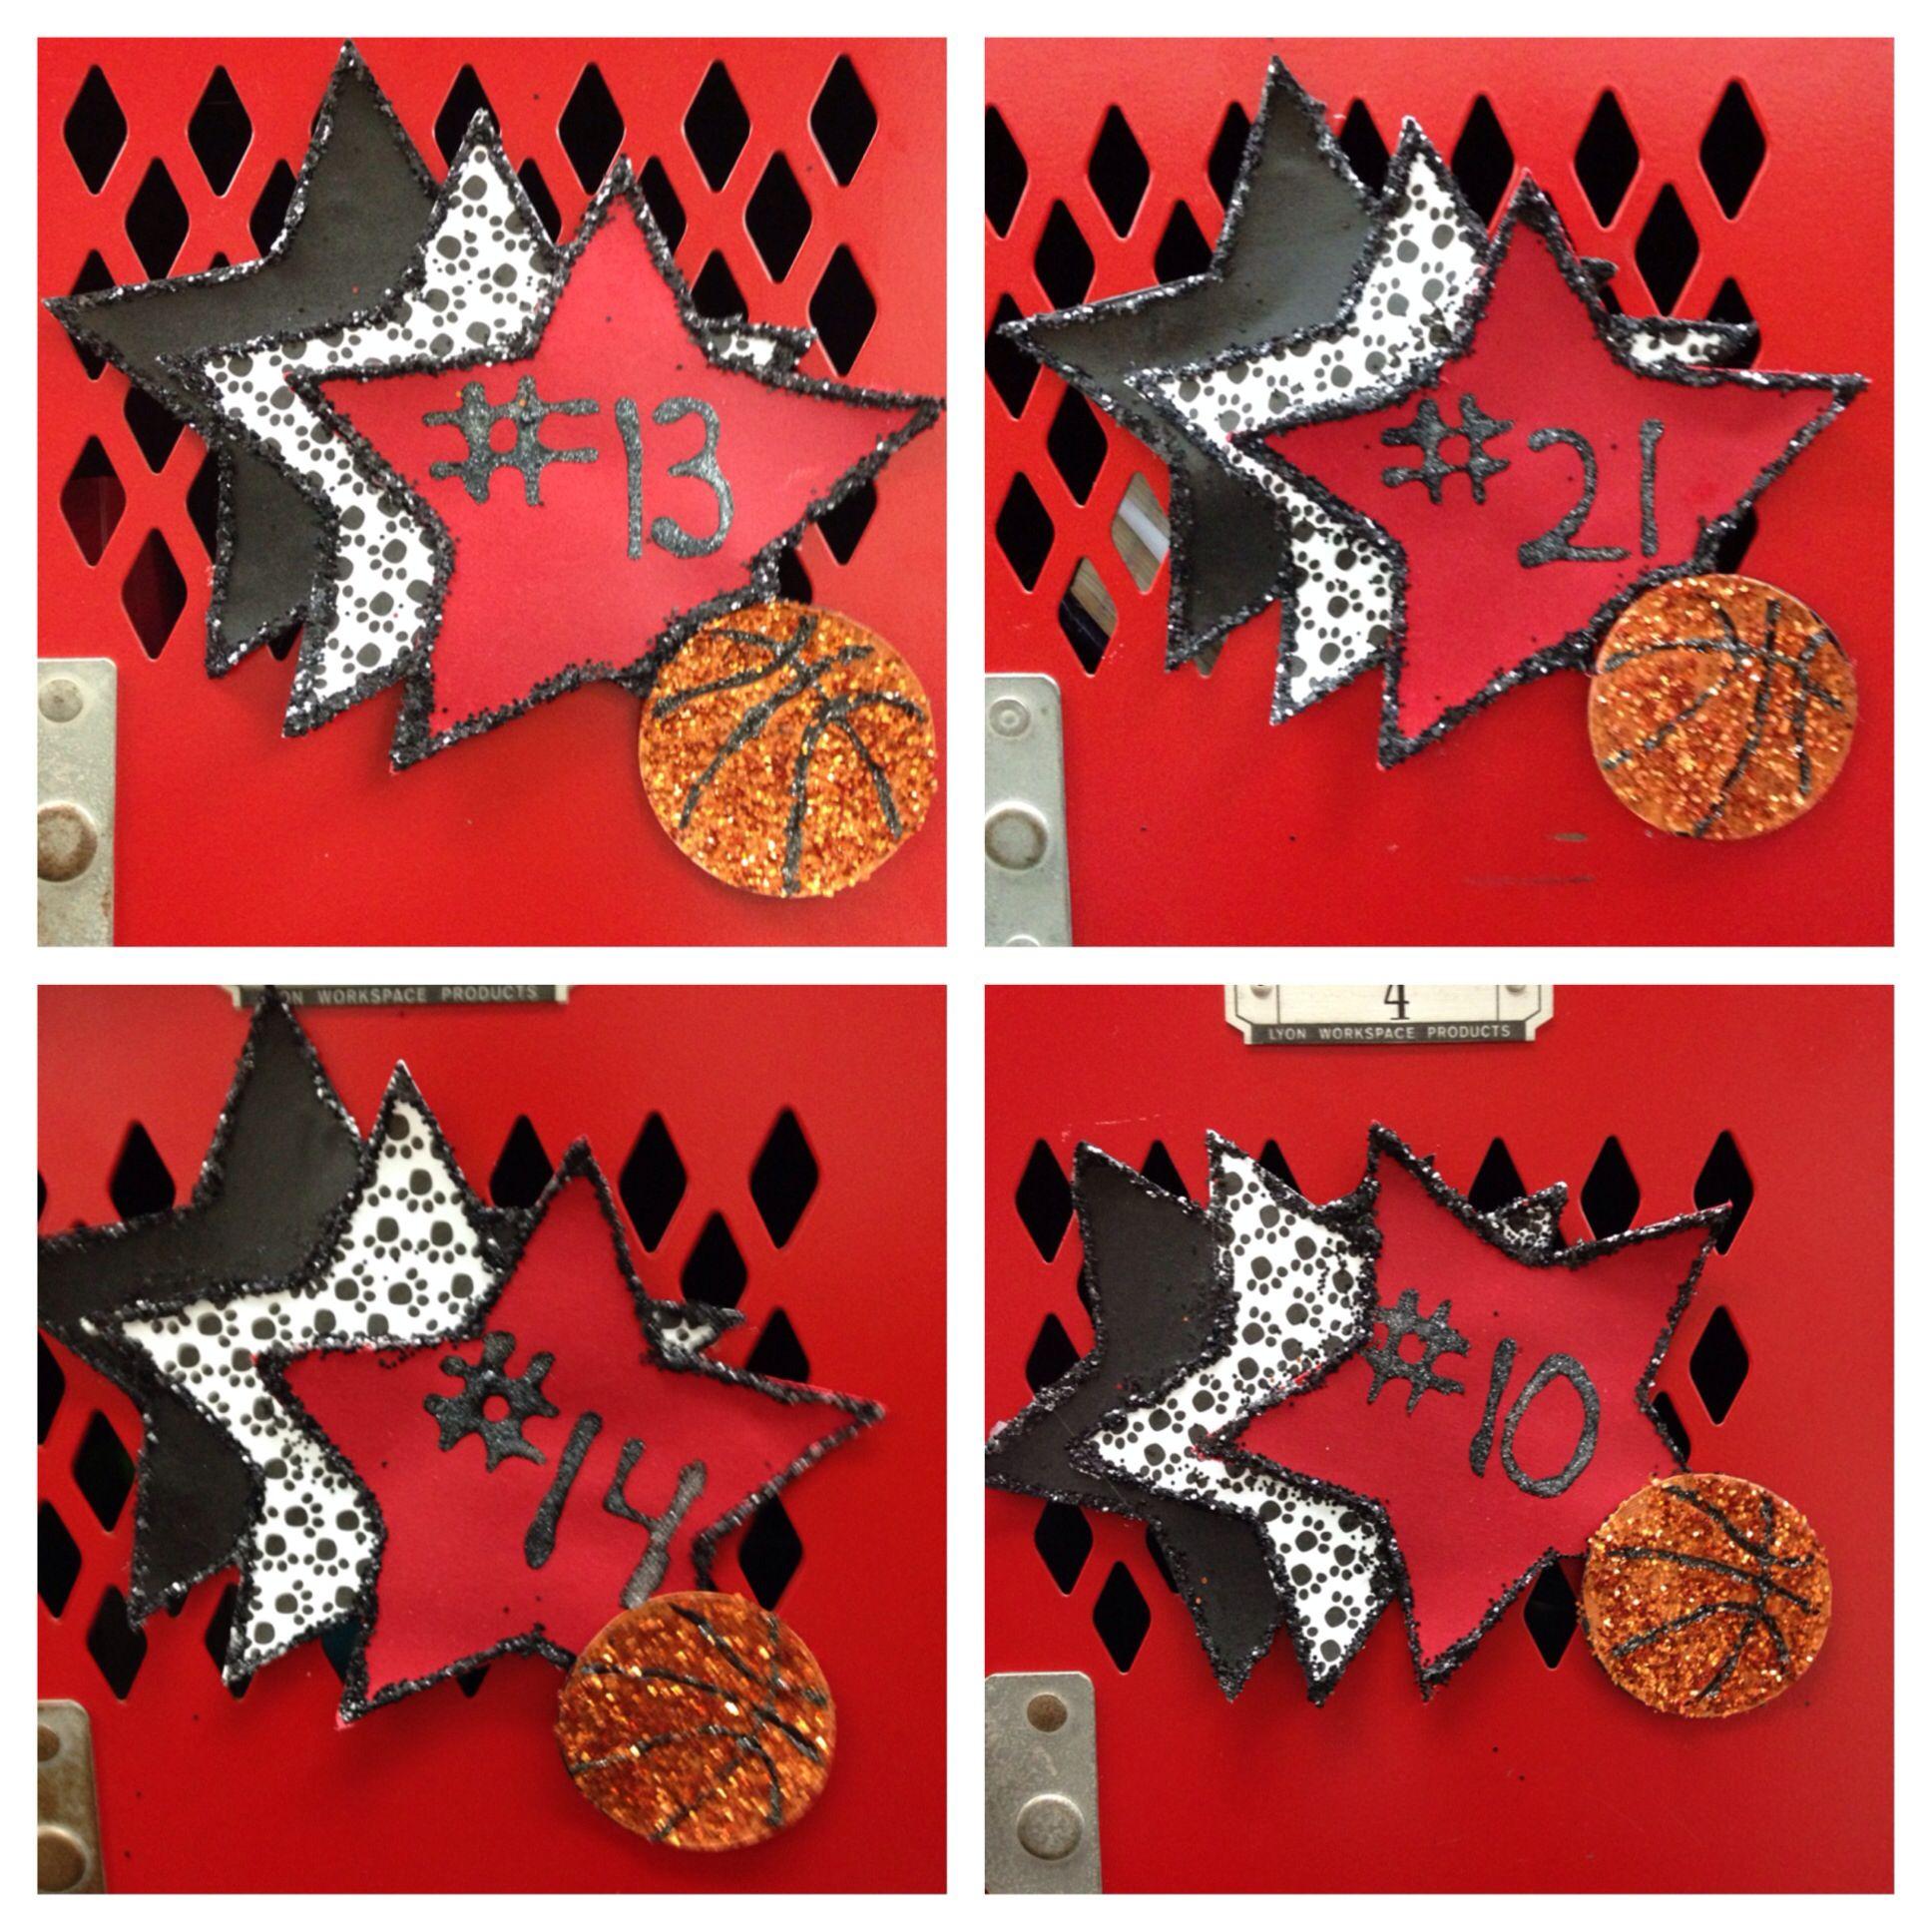 Pin By Cindy Holley On High School Spirit Cheer Locker Decorations Locker Decorations Sports Locker Decorations